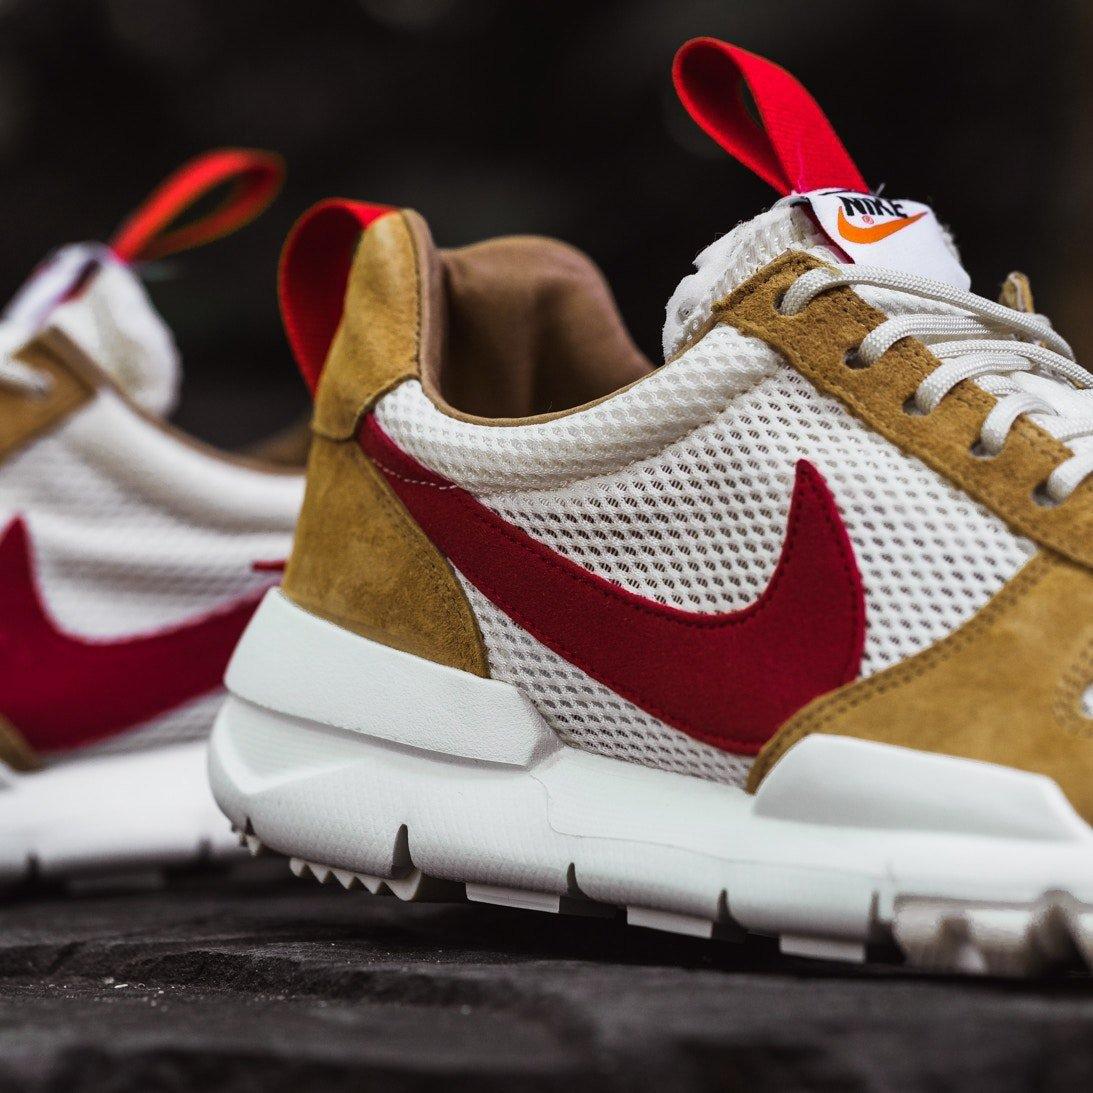 Tom Sachs x Nike Mars Yard 2.0 NASA Sneakers